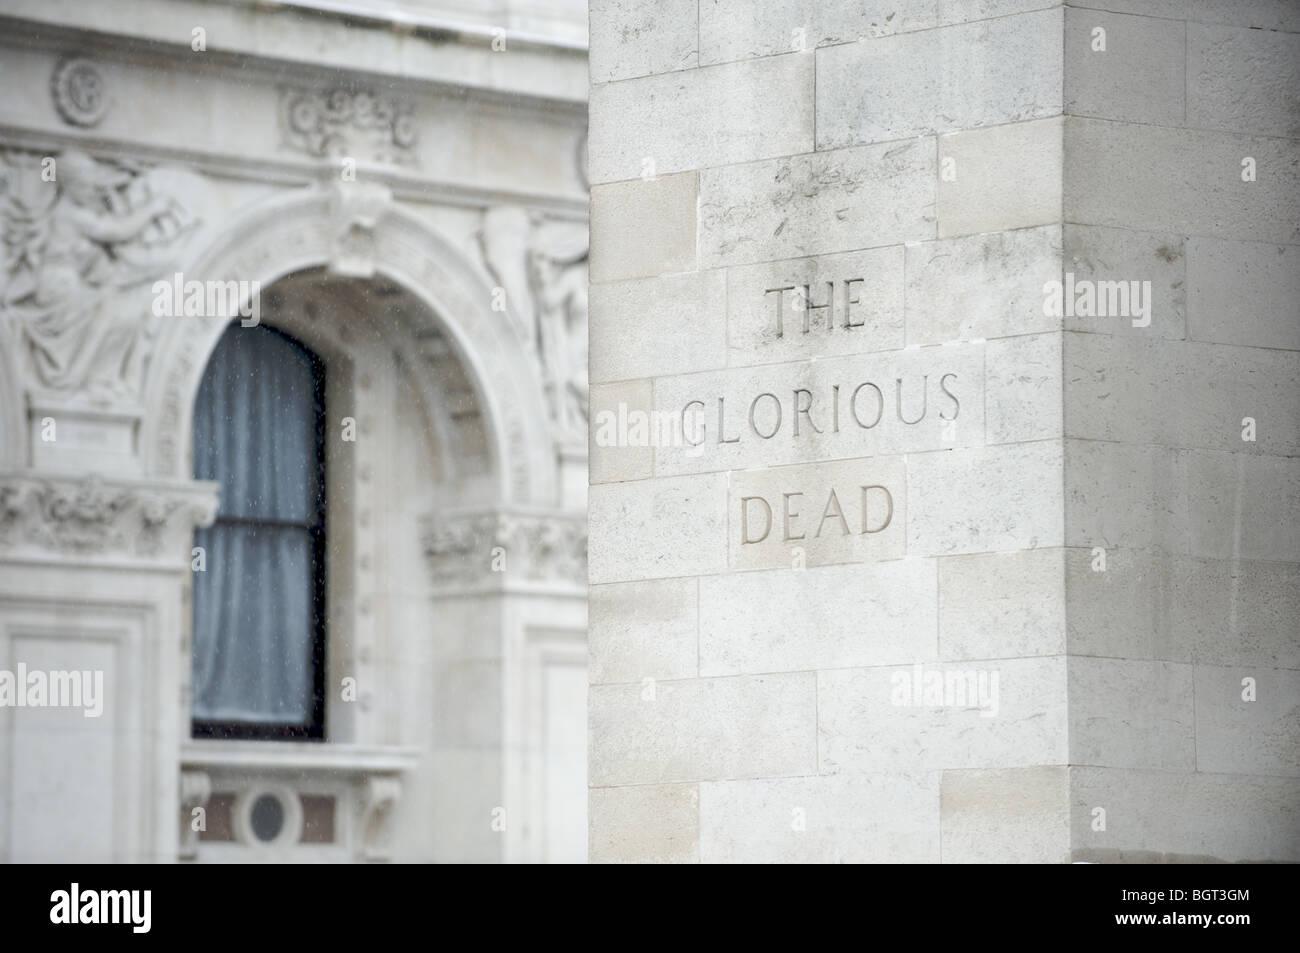 'The Glorious Dead' inscription on the Cenotaph, London - Stock Image